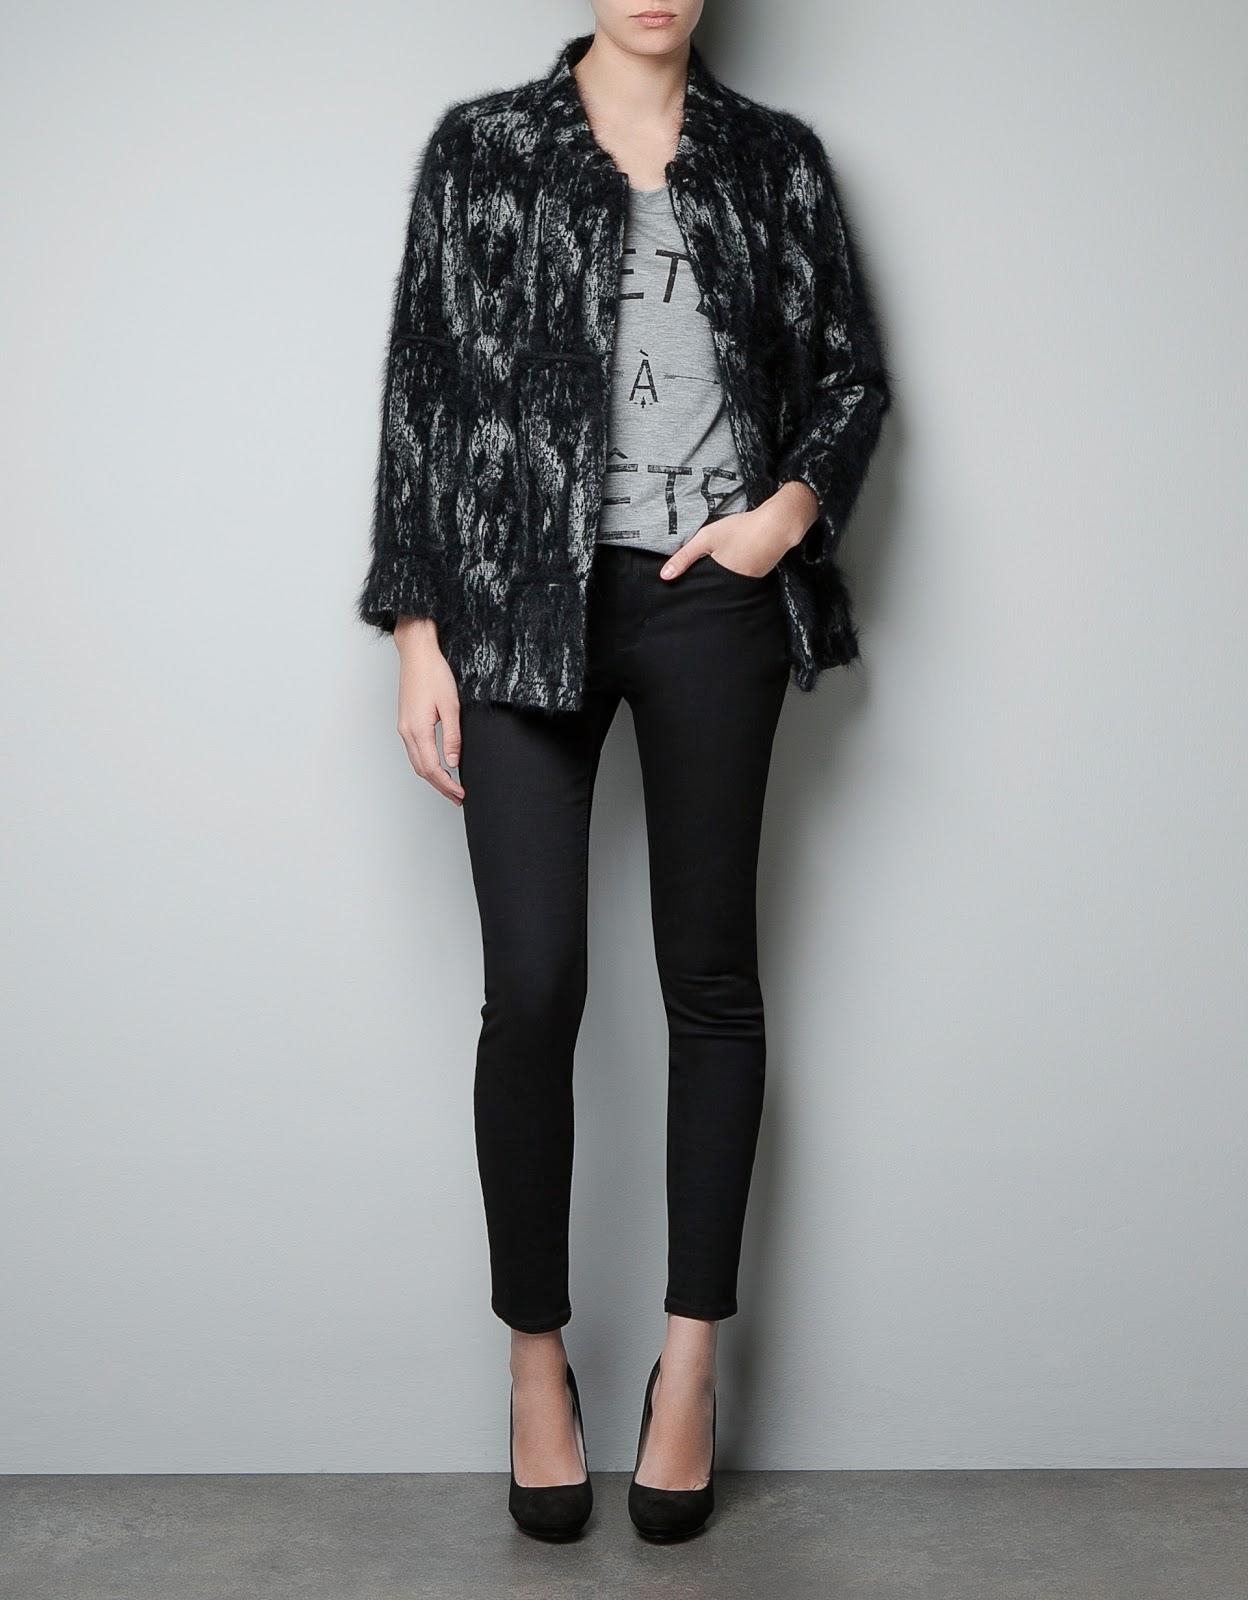 37d4aba5 ZARA- Studio fantasy three quarter length coat £219.00 €249.00 $349.00